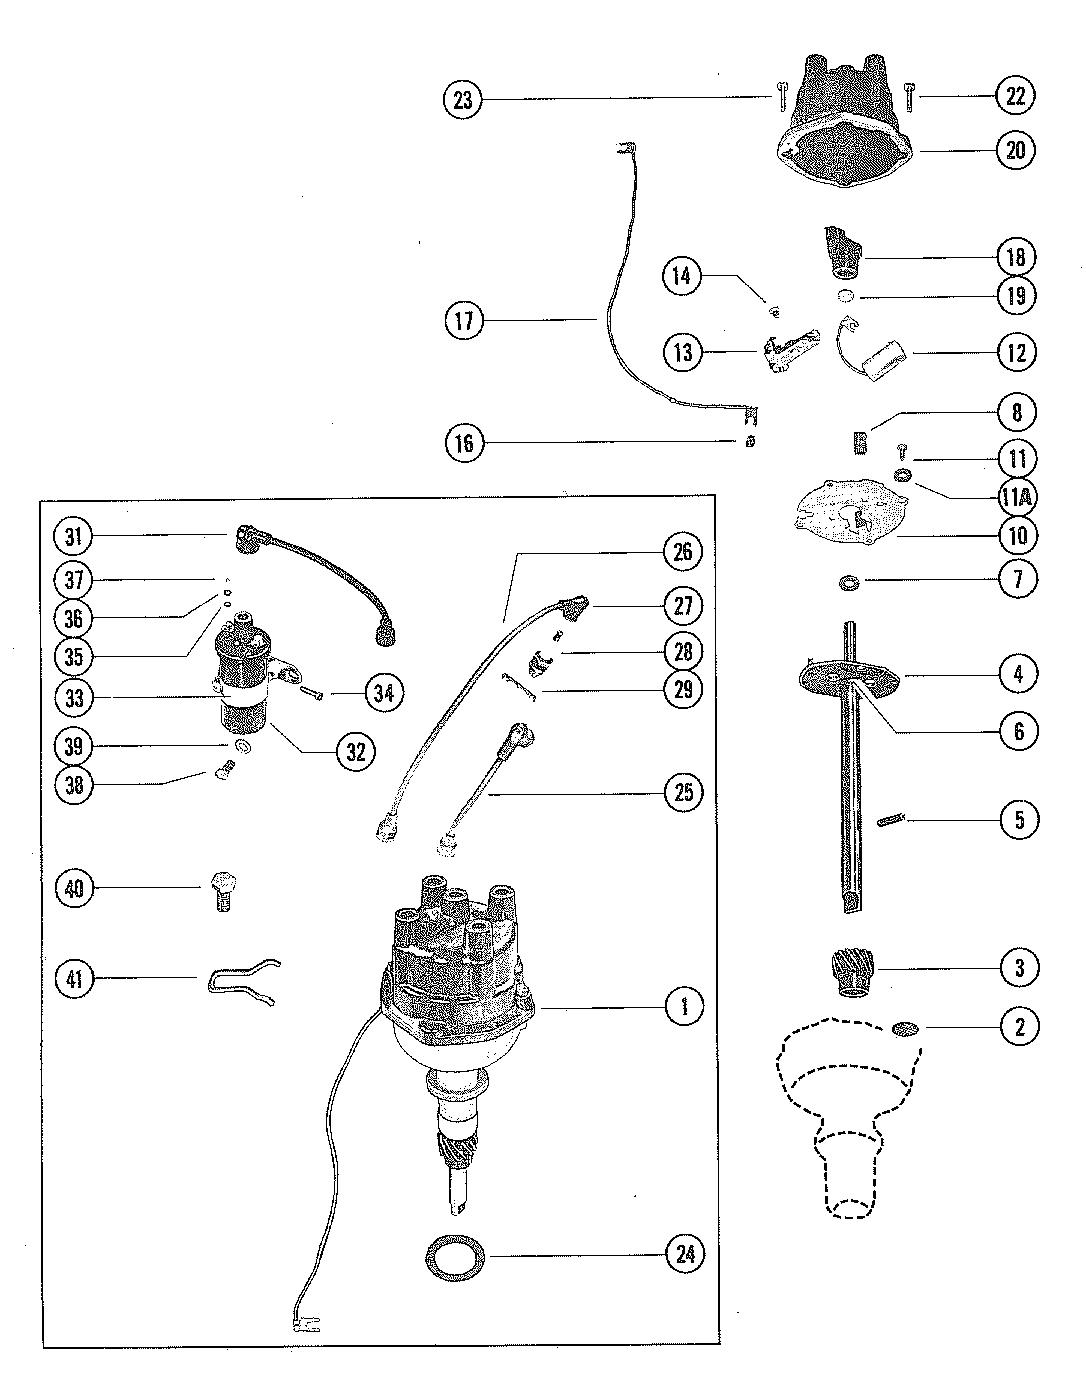 Wiring Diagram For Mercury Outboard Altaoakridge Com